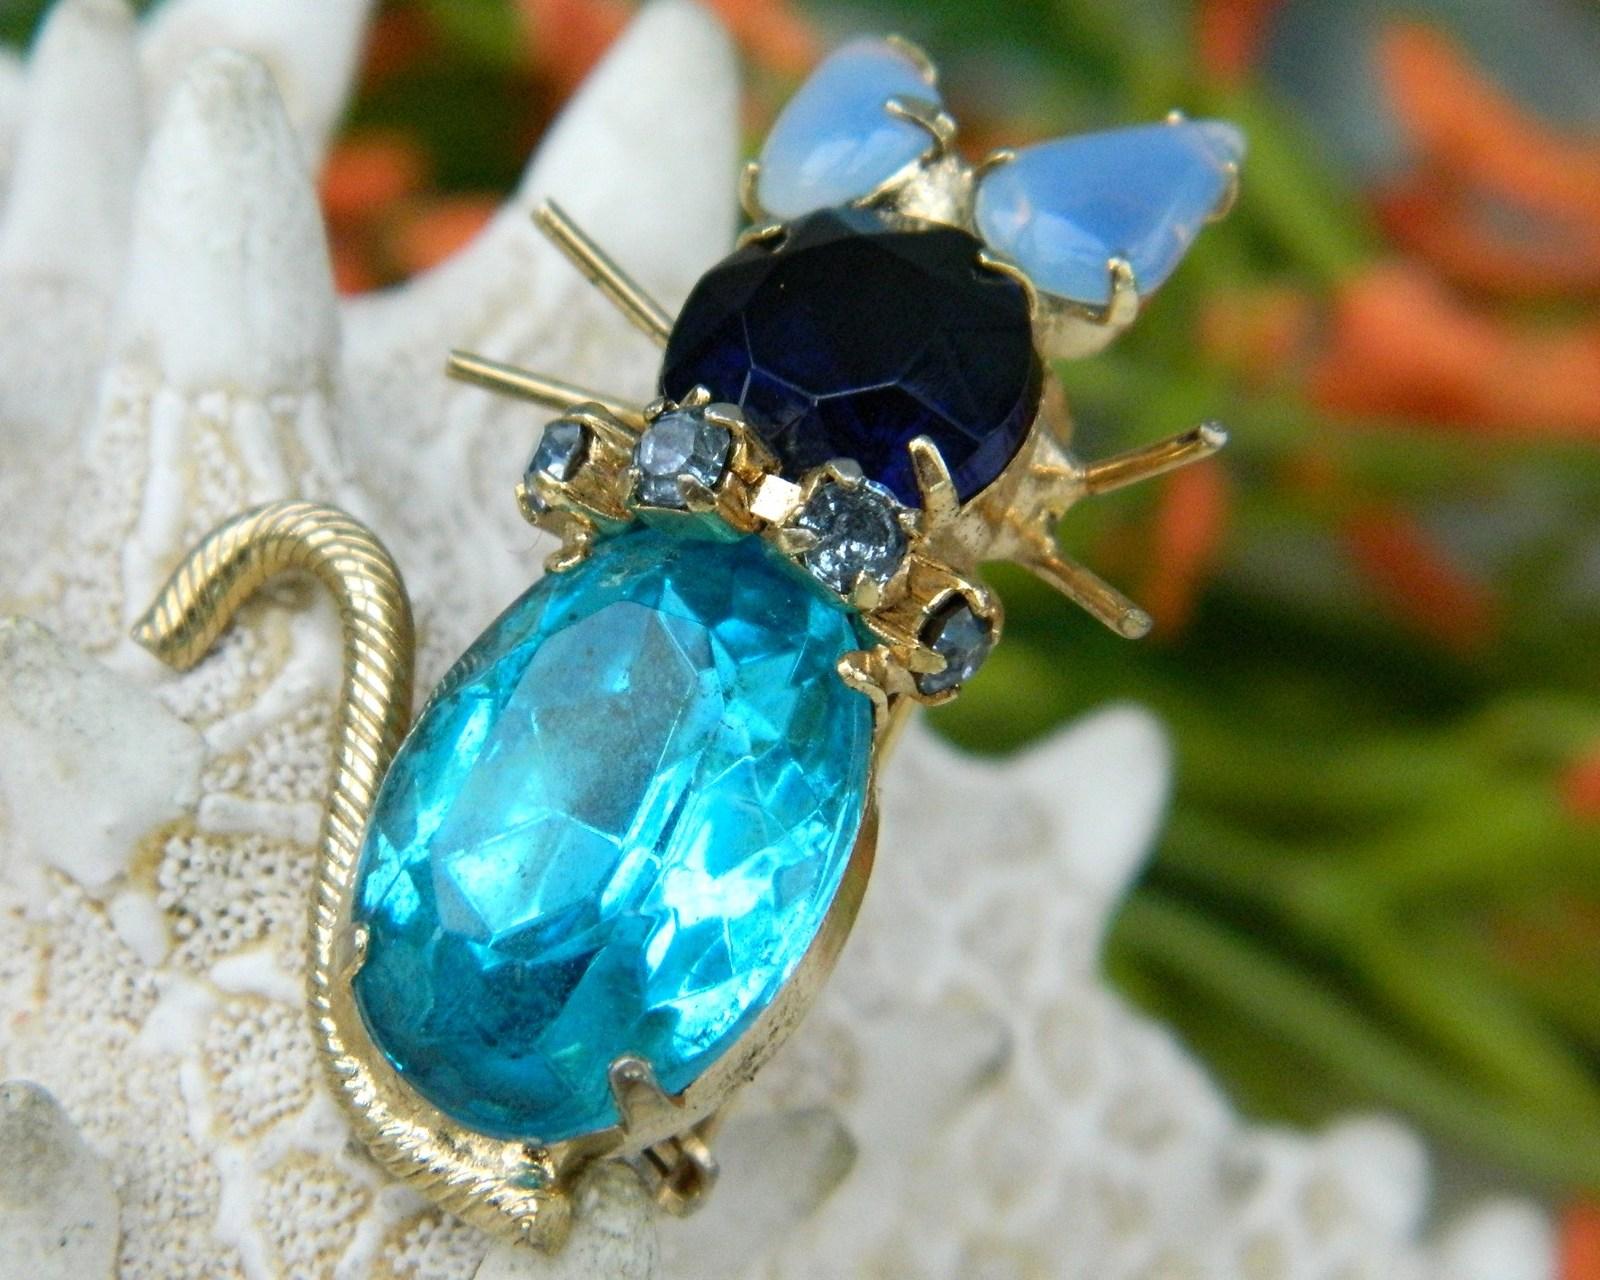 Vintage Cat Brooch Pin Turquoise Blue Rhinestones Prong Set